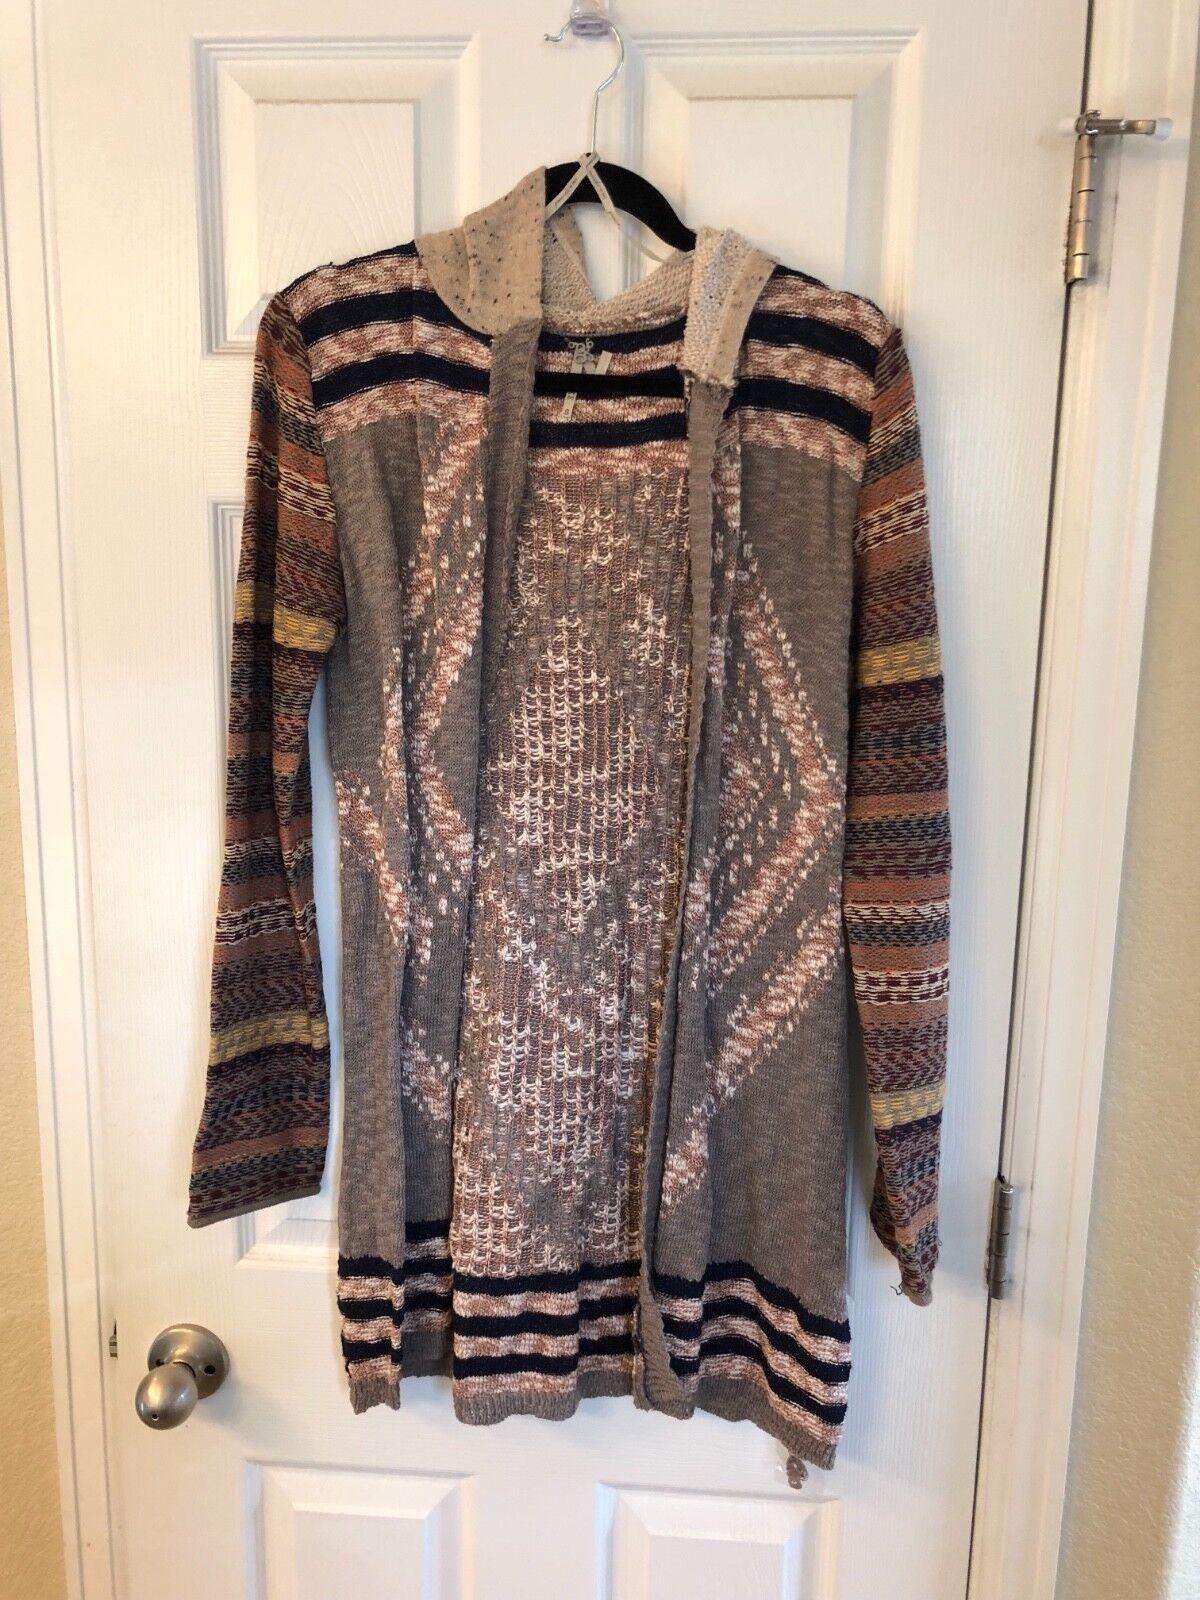 Gimmicks by BKE Aztec Cardigan Sweater Hooded Größe S